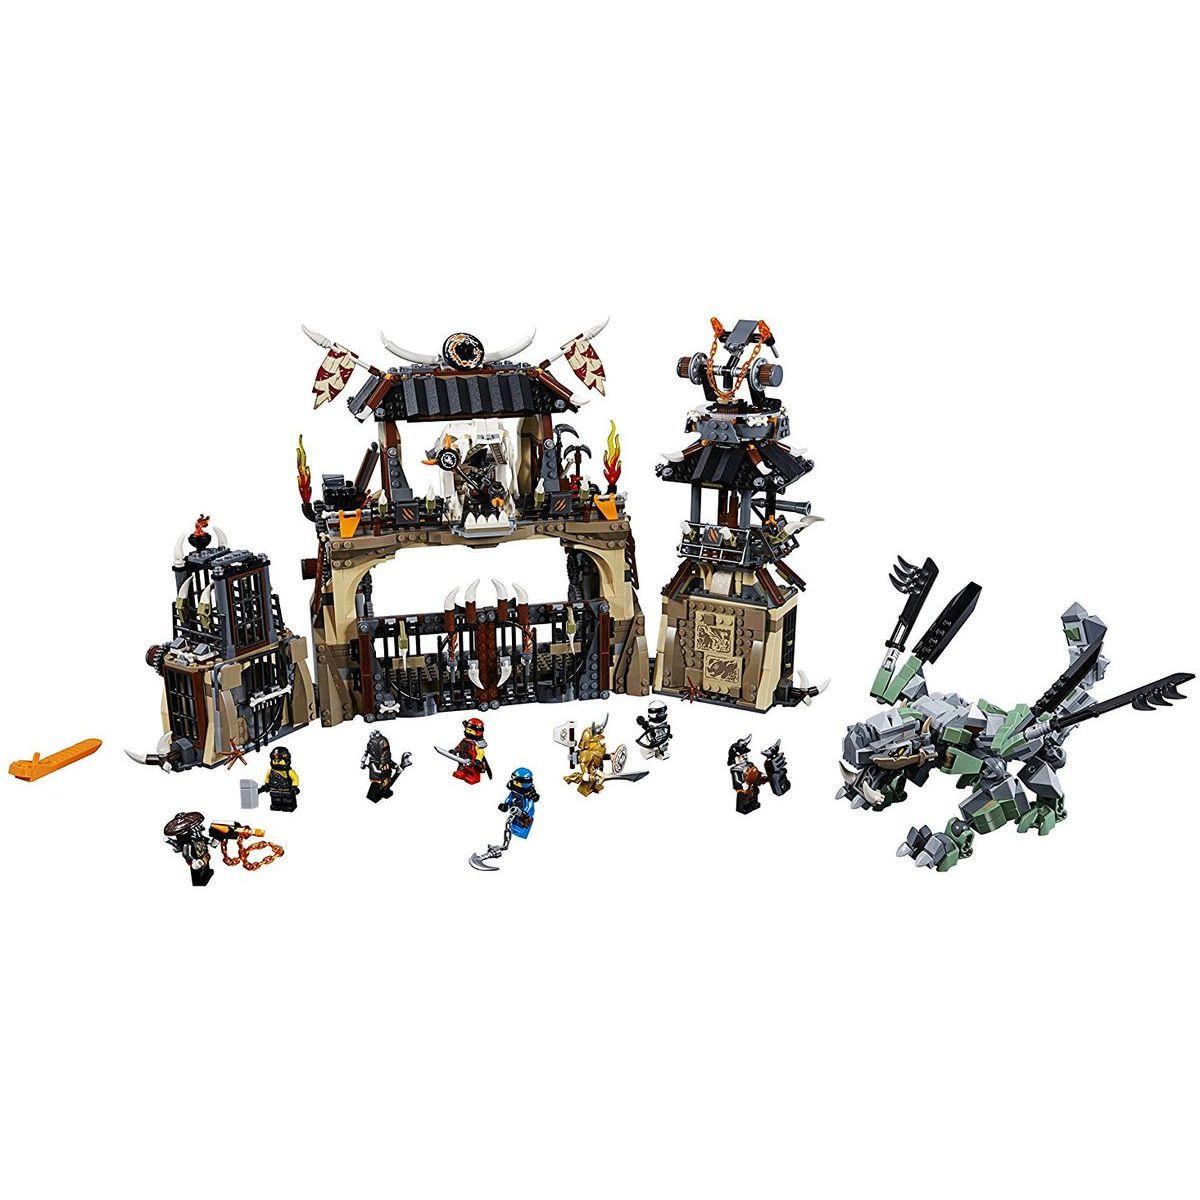 LEGO 70655 Ninjago Dračí jáma - Poškozený obal